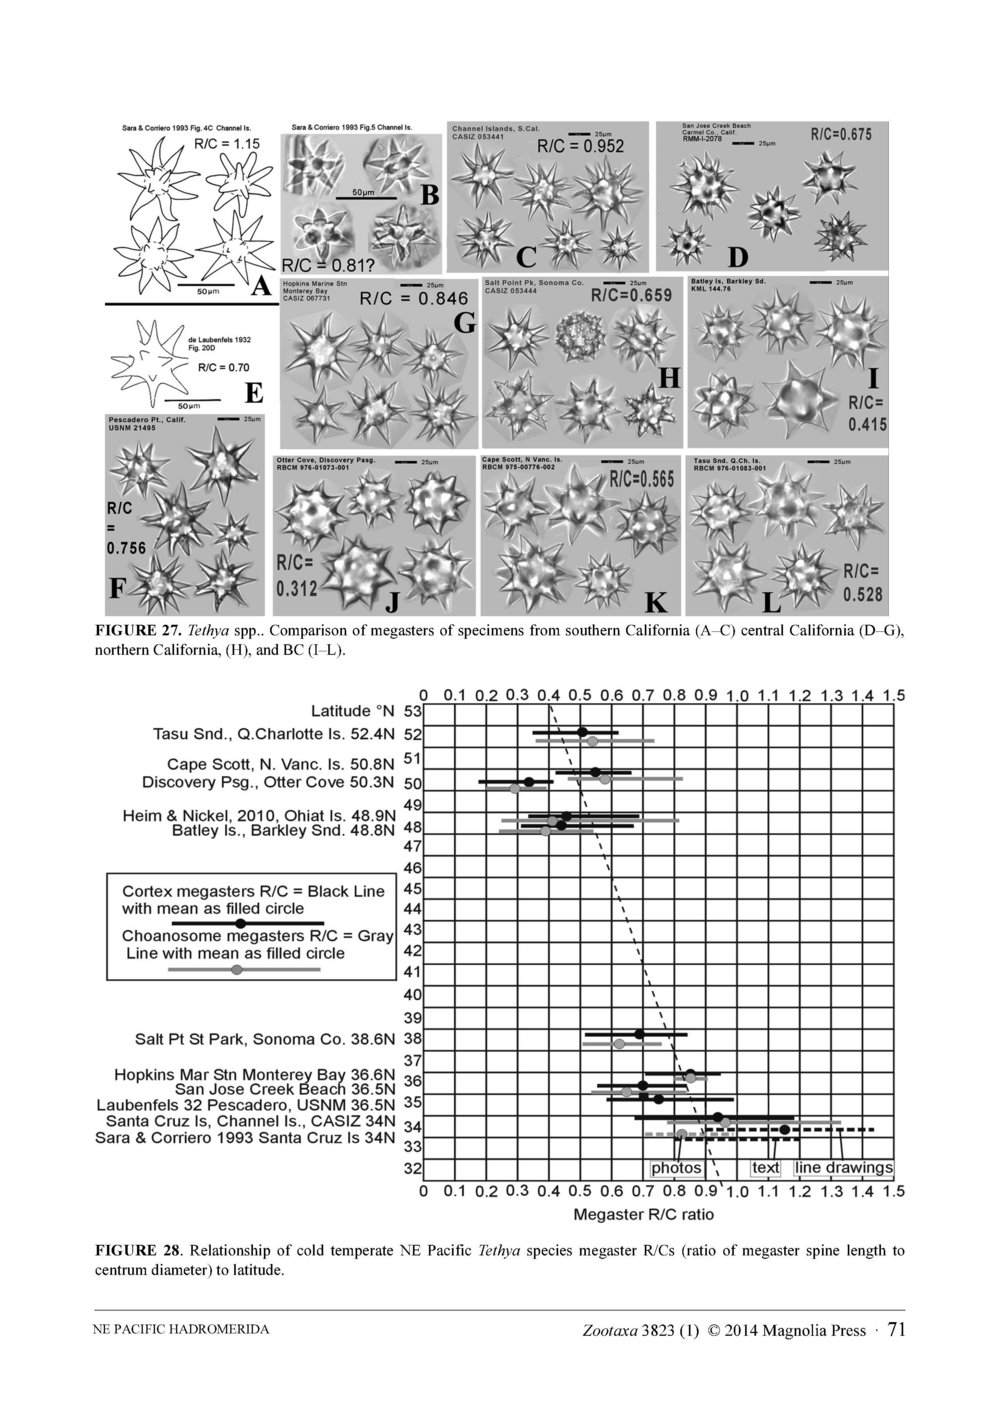 Austin et al 2014 NE Pacific Hadromerids_Page_71.jpg